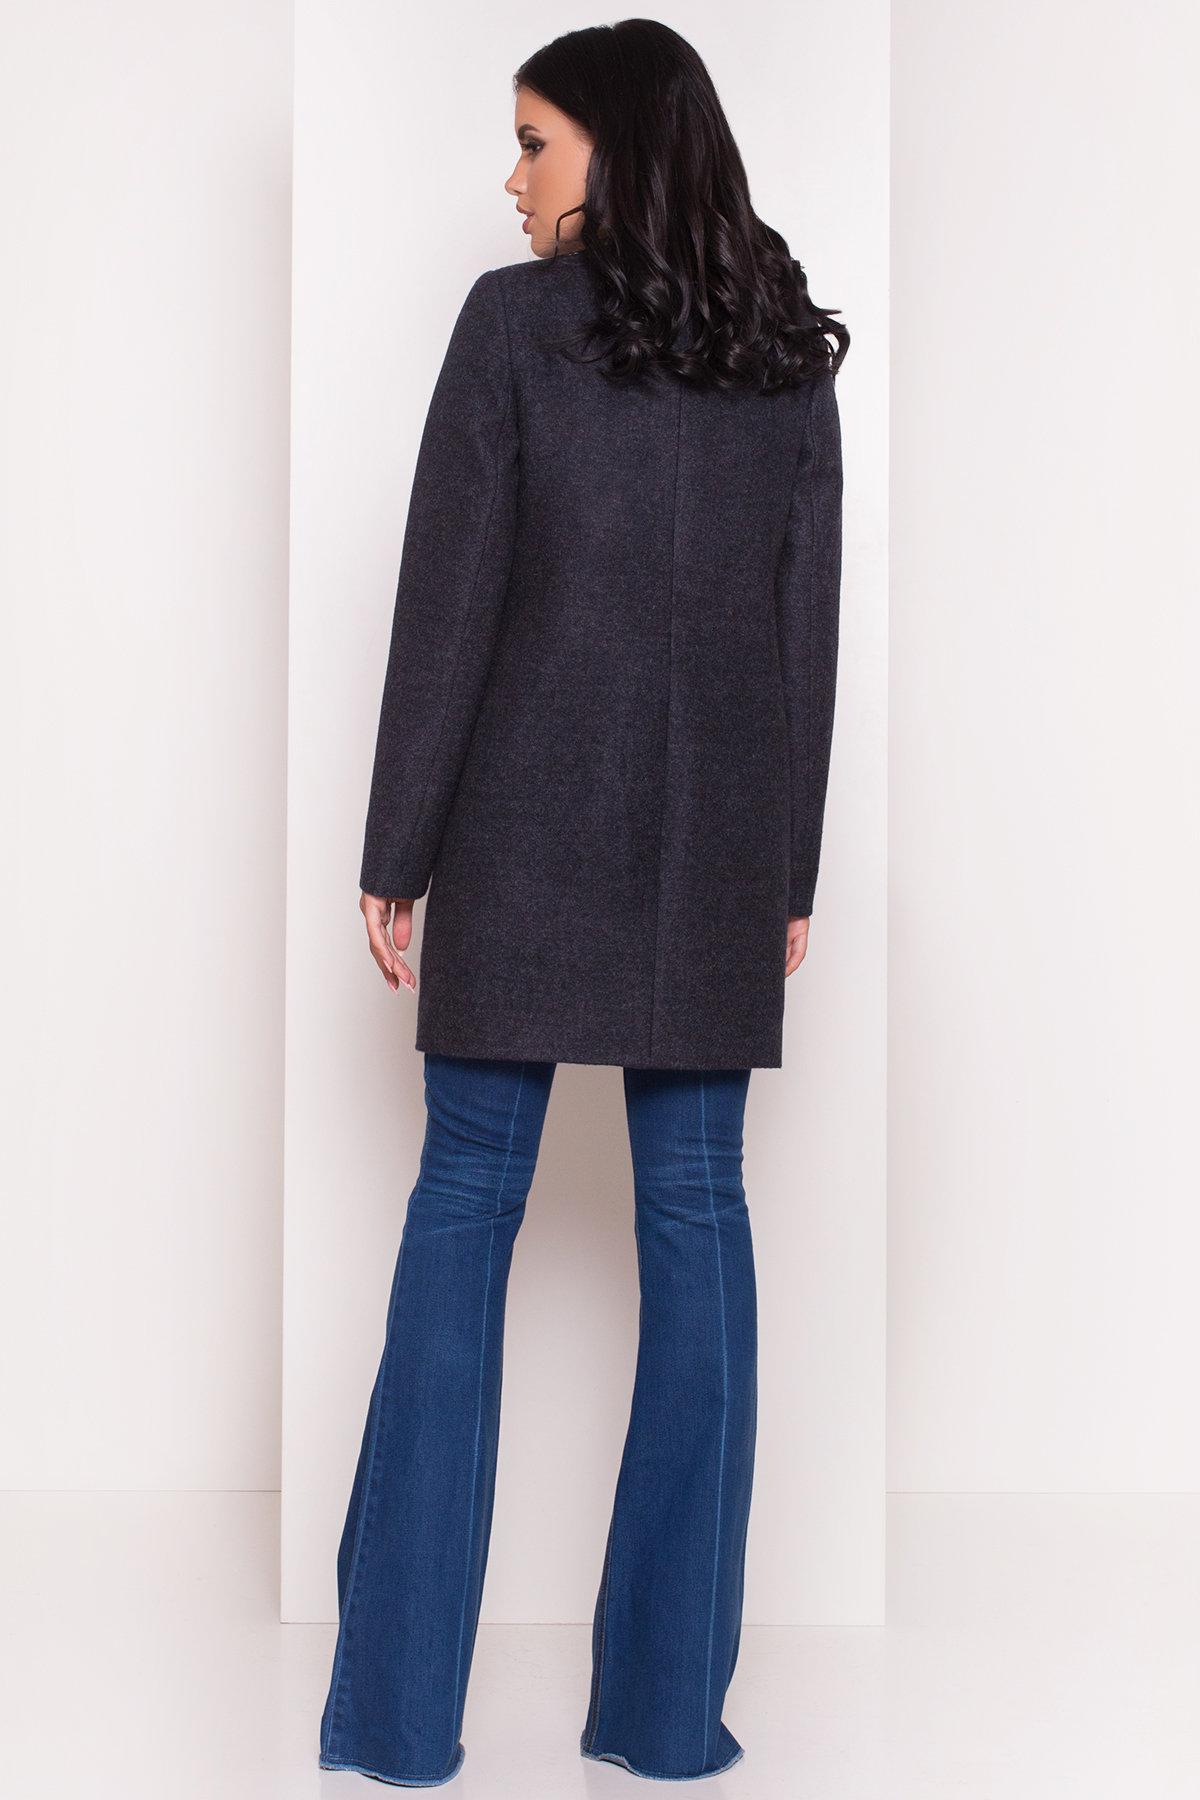 Демисезонное пальто Ферран 5369 АРТ. 36594 Цвет: Темно-синий - фото 4, интернет магазин tm-modus.ru